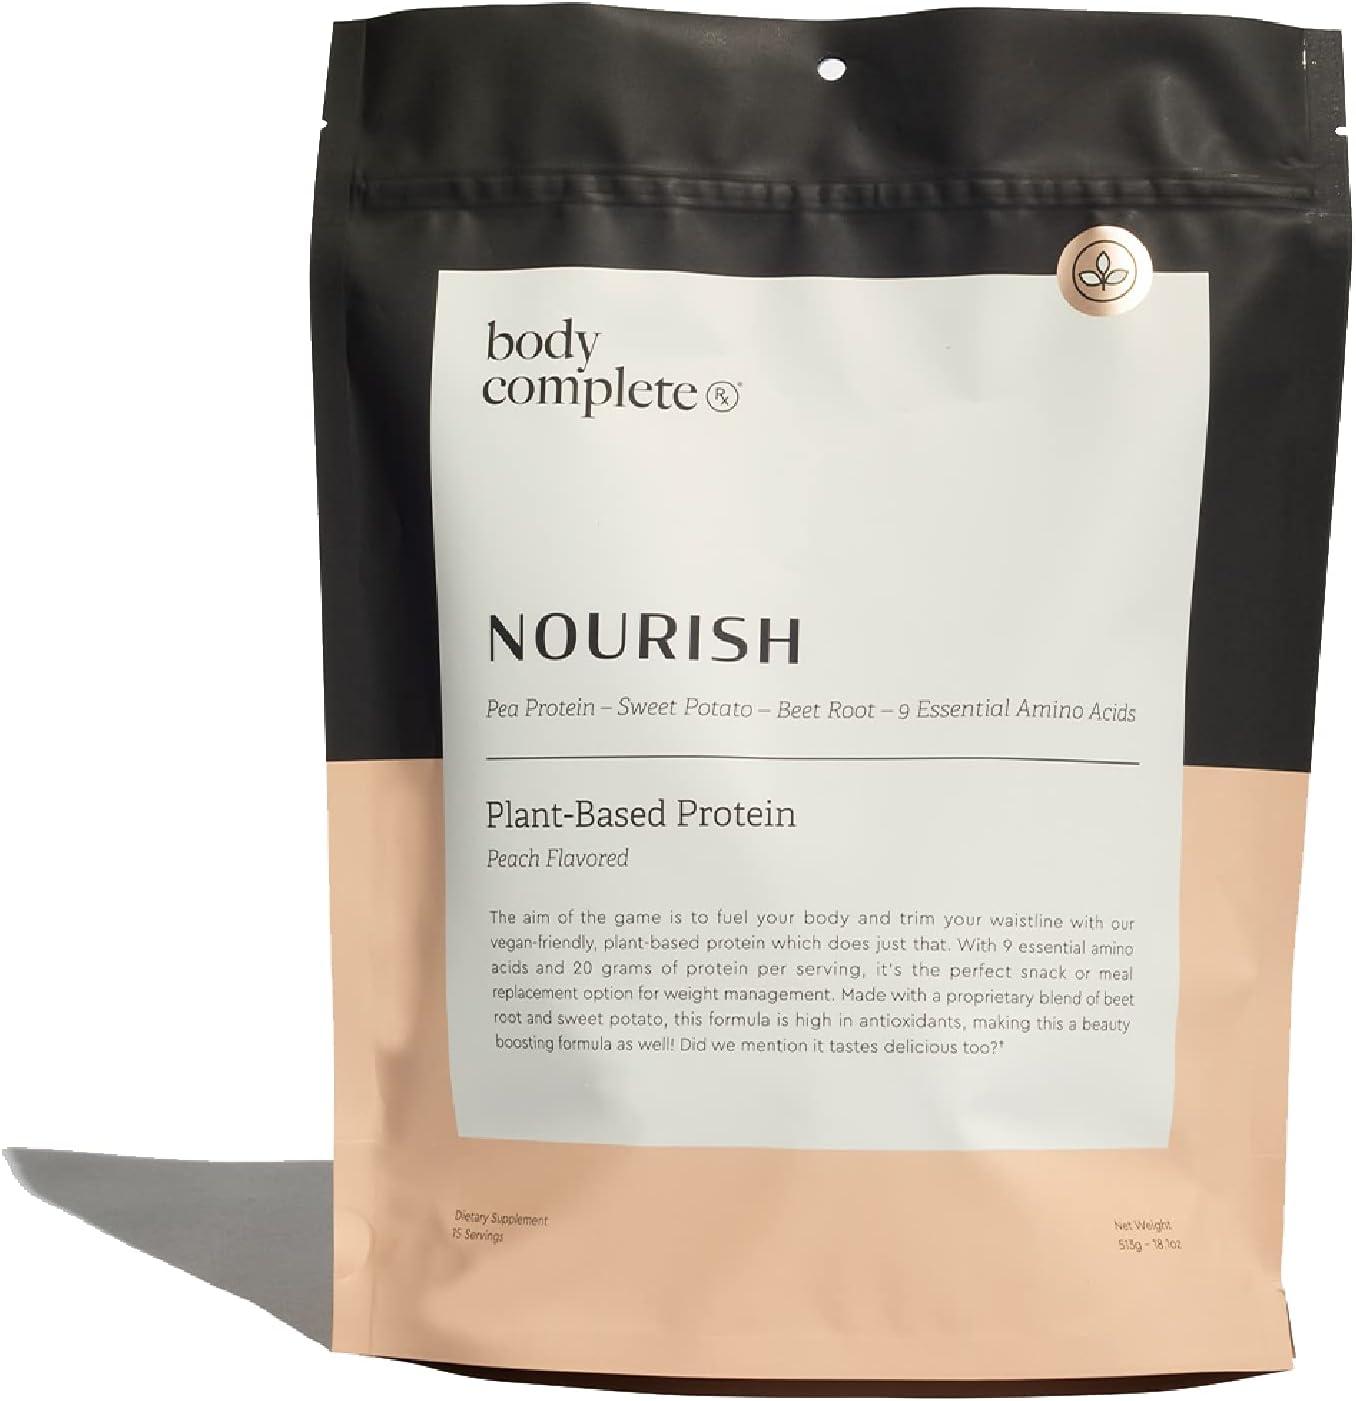 Body Complete Rx - Nourish - Protein (Peach, 15 Servings)